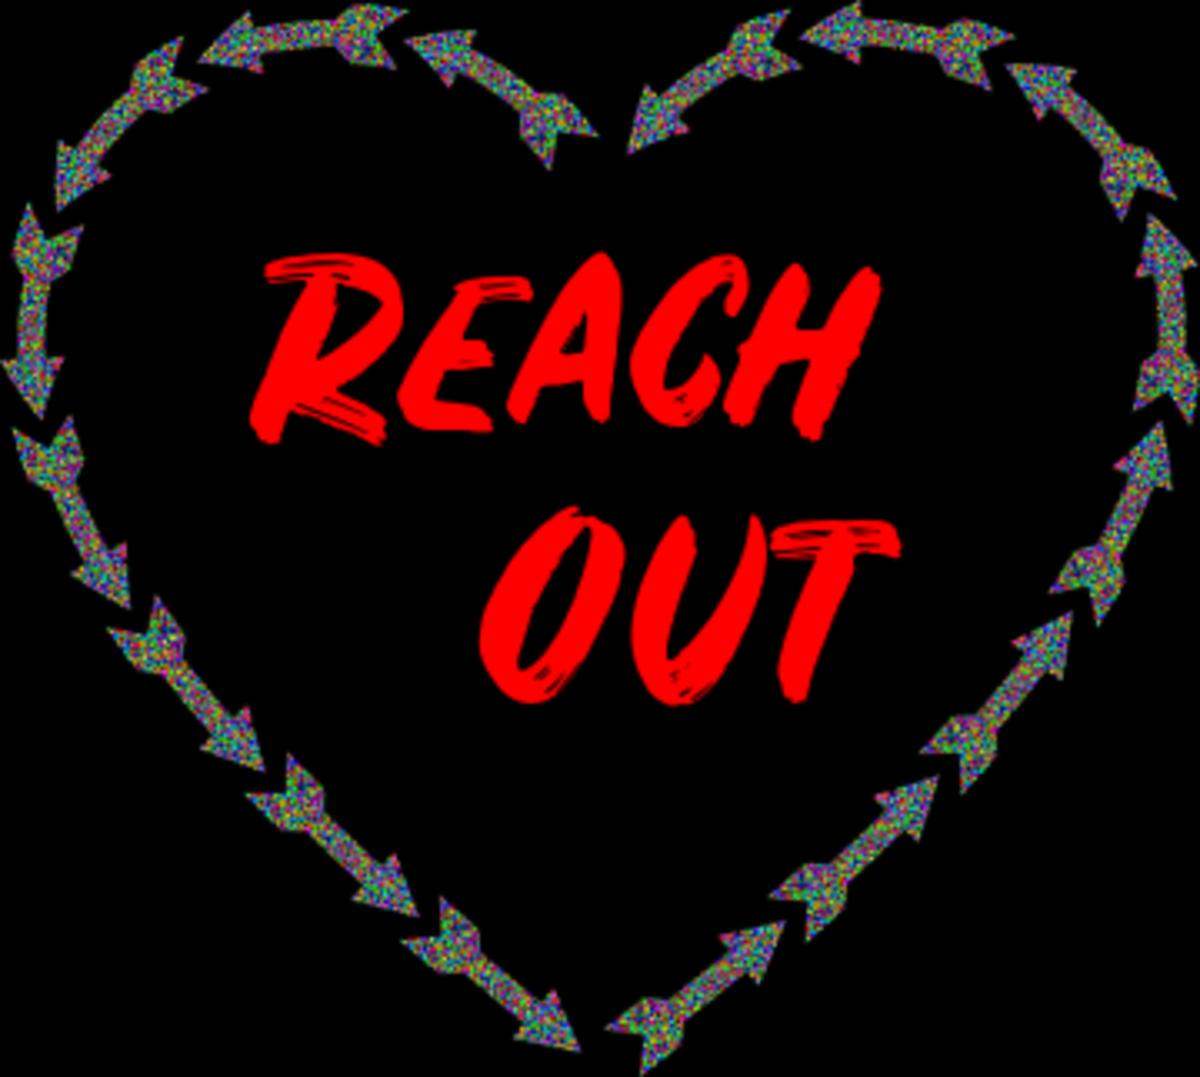 Poem: Reach Out